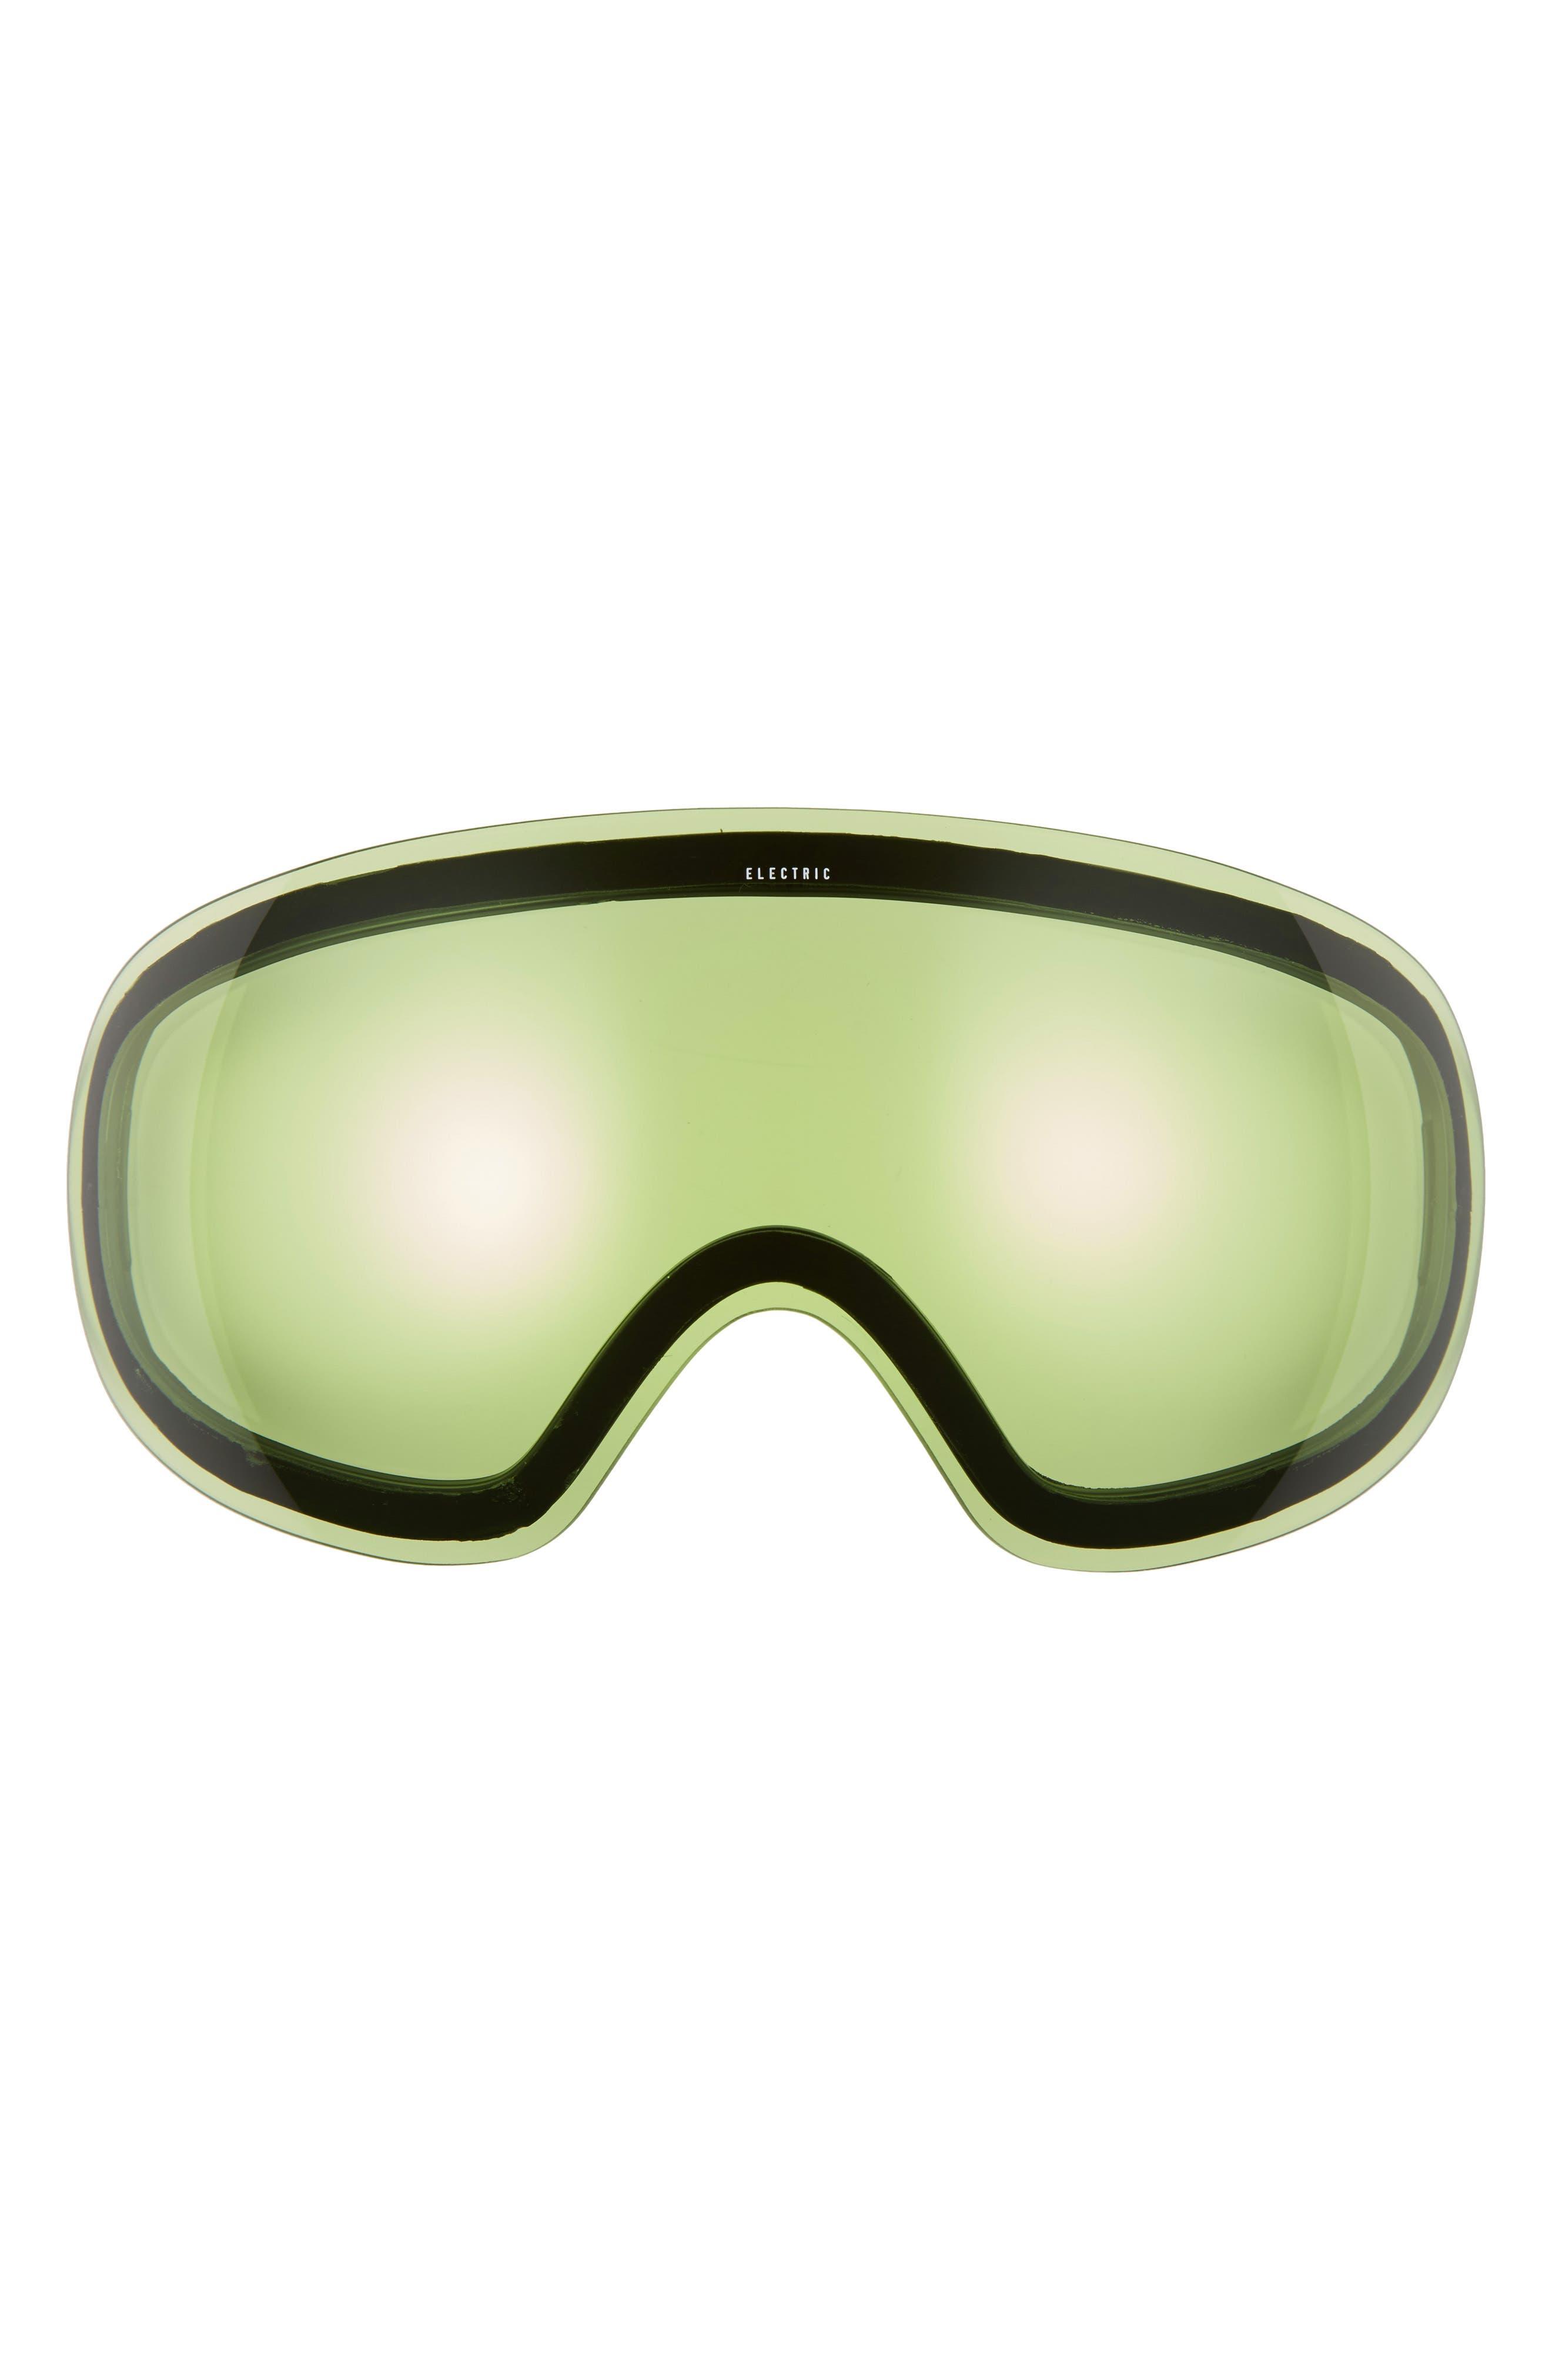 EG3 254mm Snow Goggles,                             Alternate thumbnail 27, color,